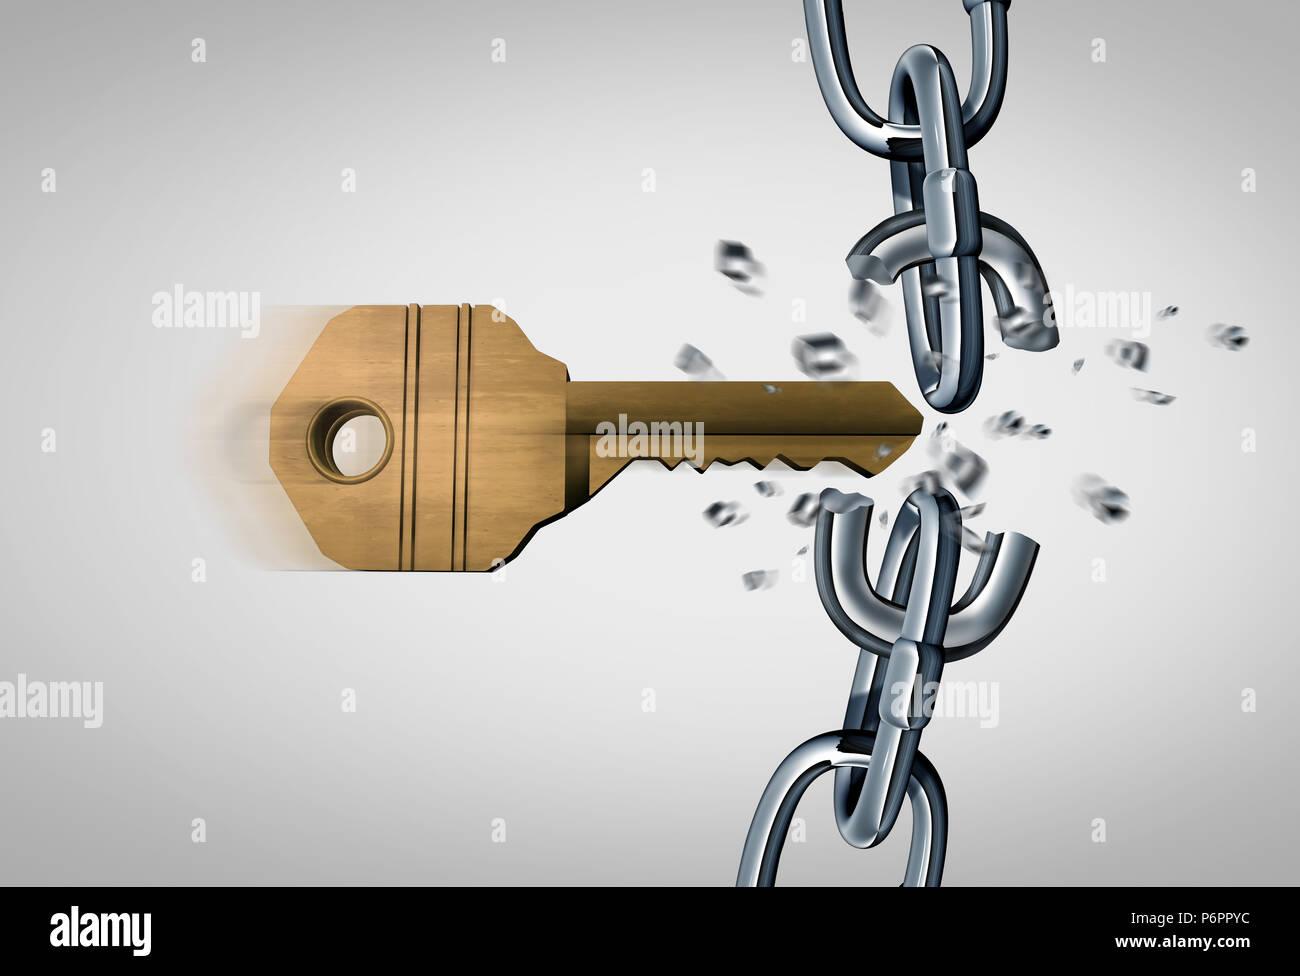 Unlock Stock Photos & Unlock Stock Images - Alamy